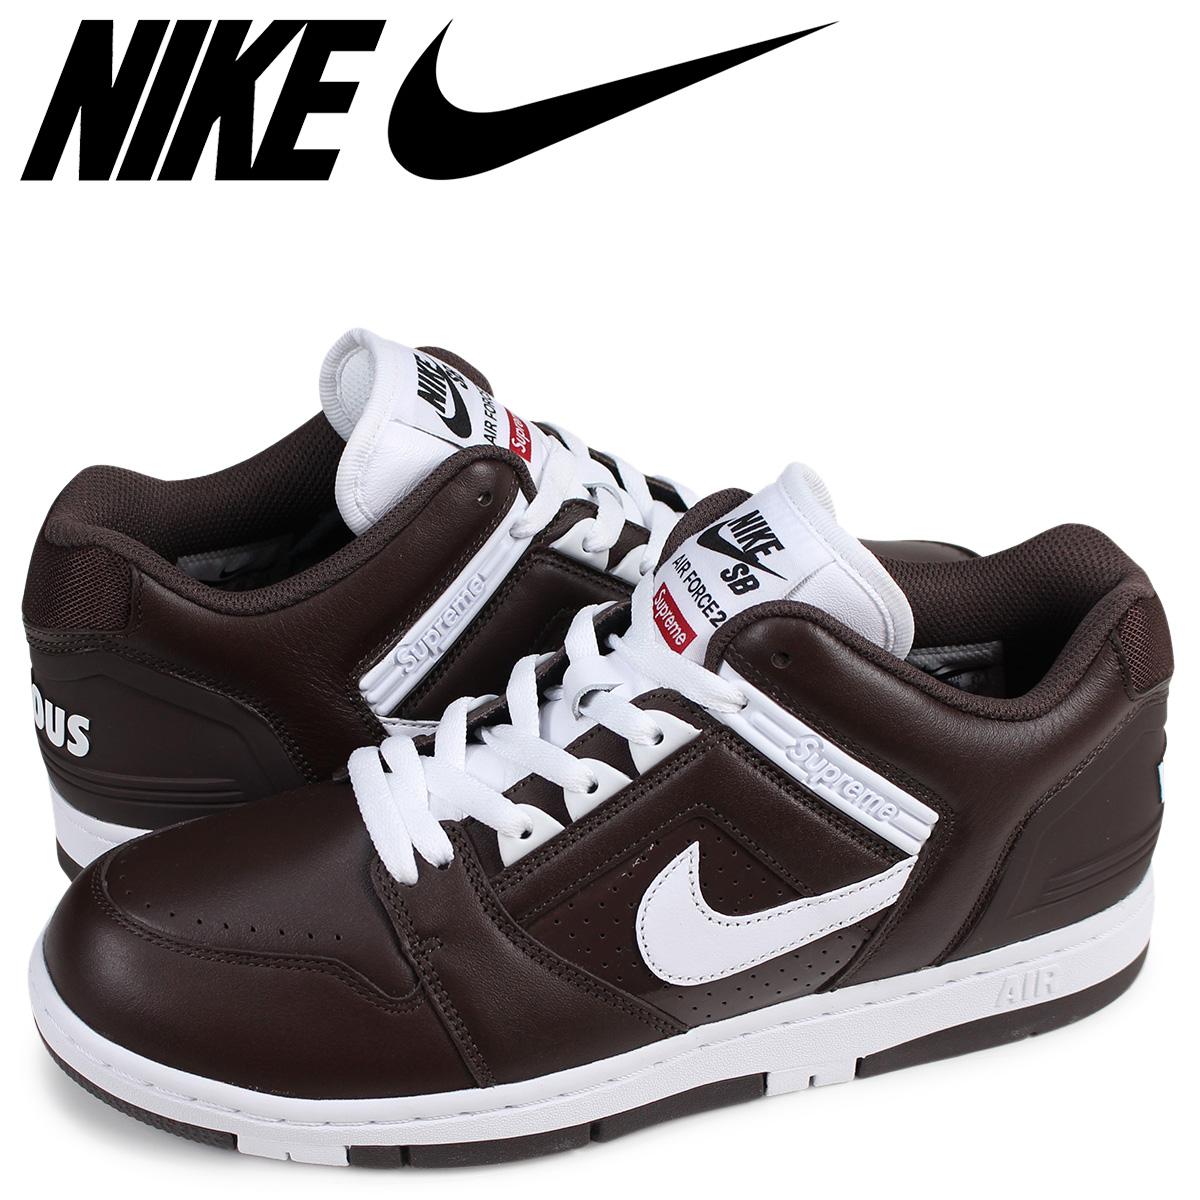 NIKE AIR FORCE 2 LOW Nike SB air force 2 sneakers men AA0871 212 brown